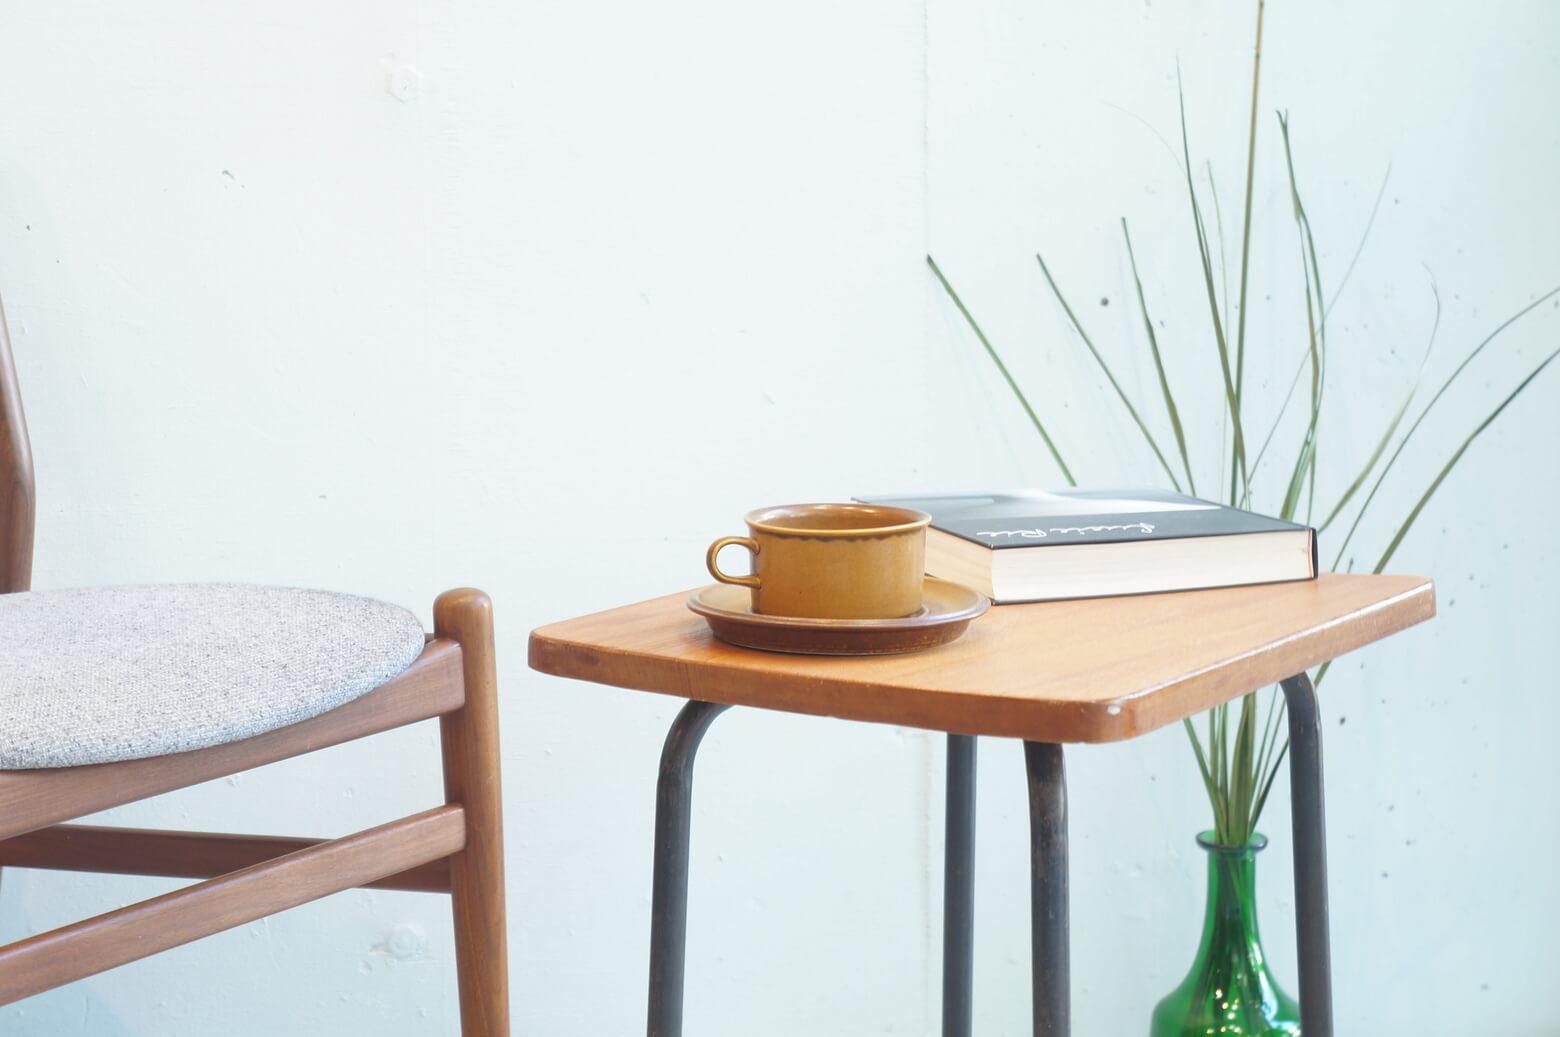 Remake Small Side Table/リメイク スモール サイドテーブル